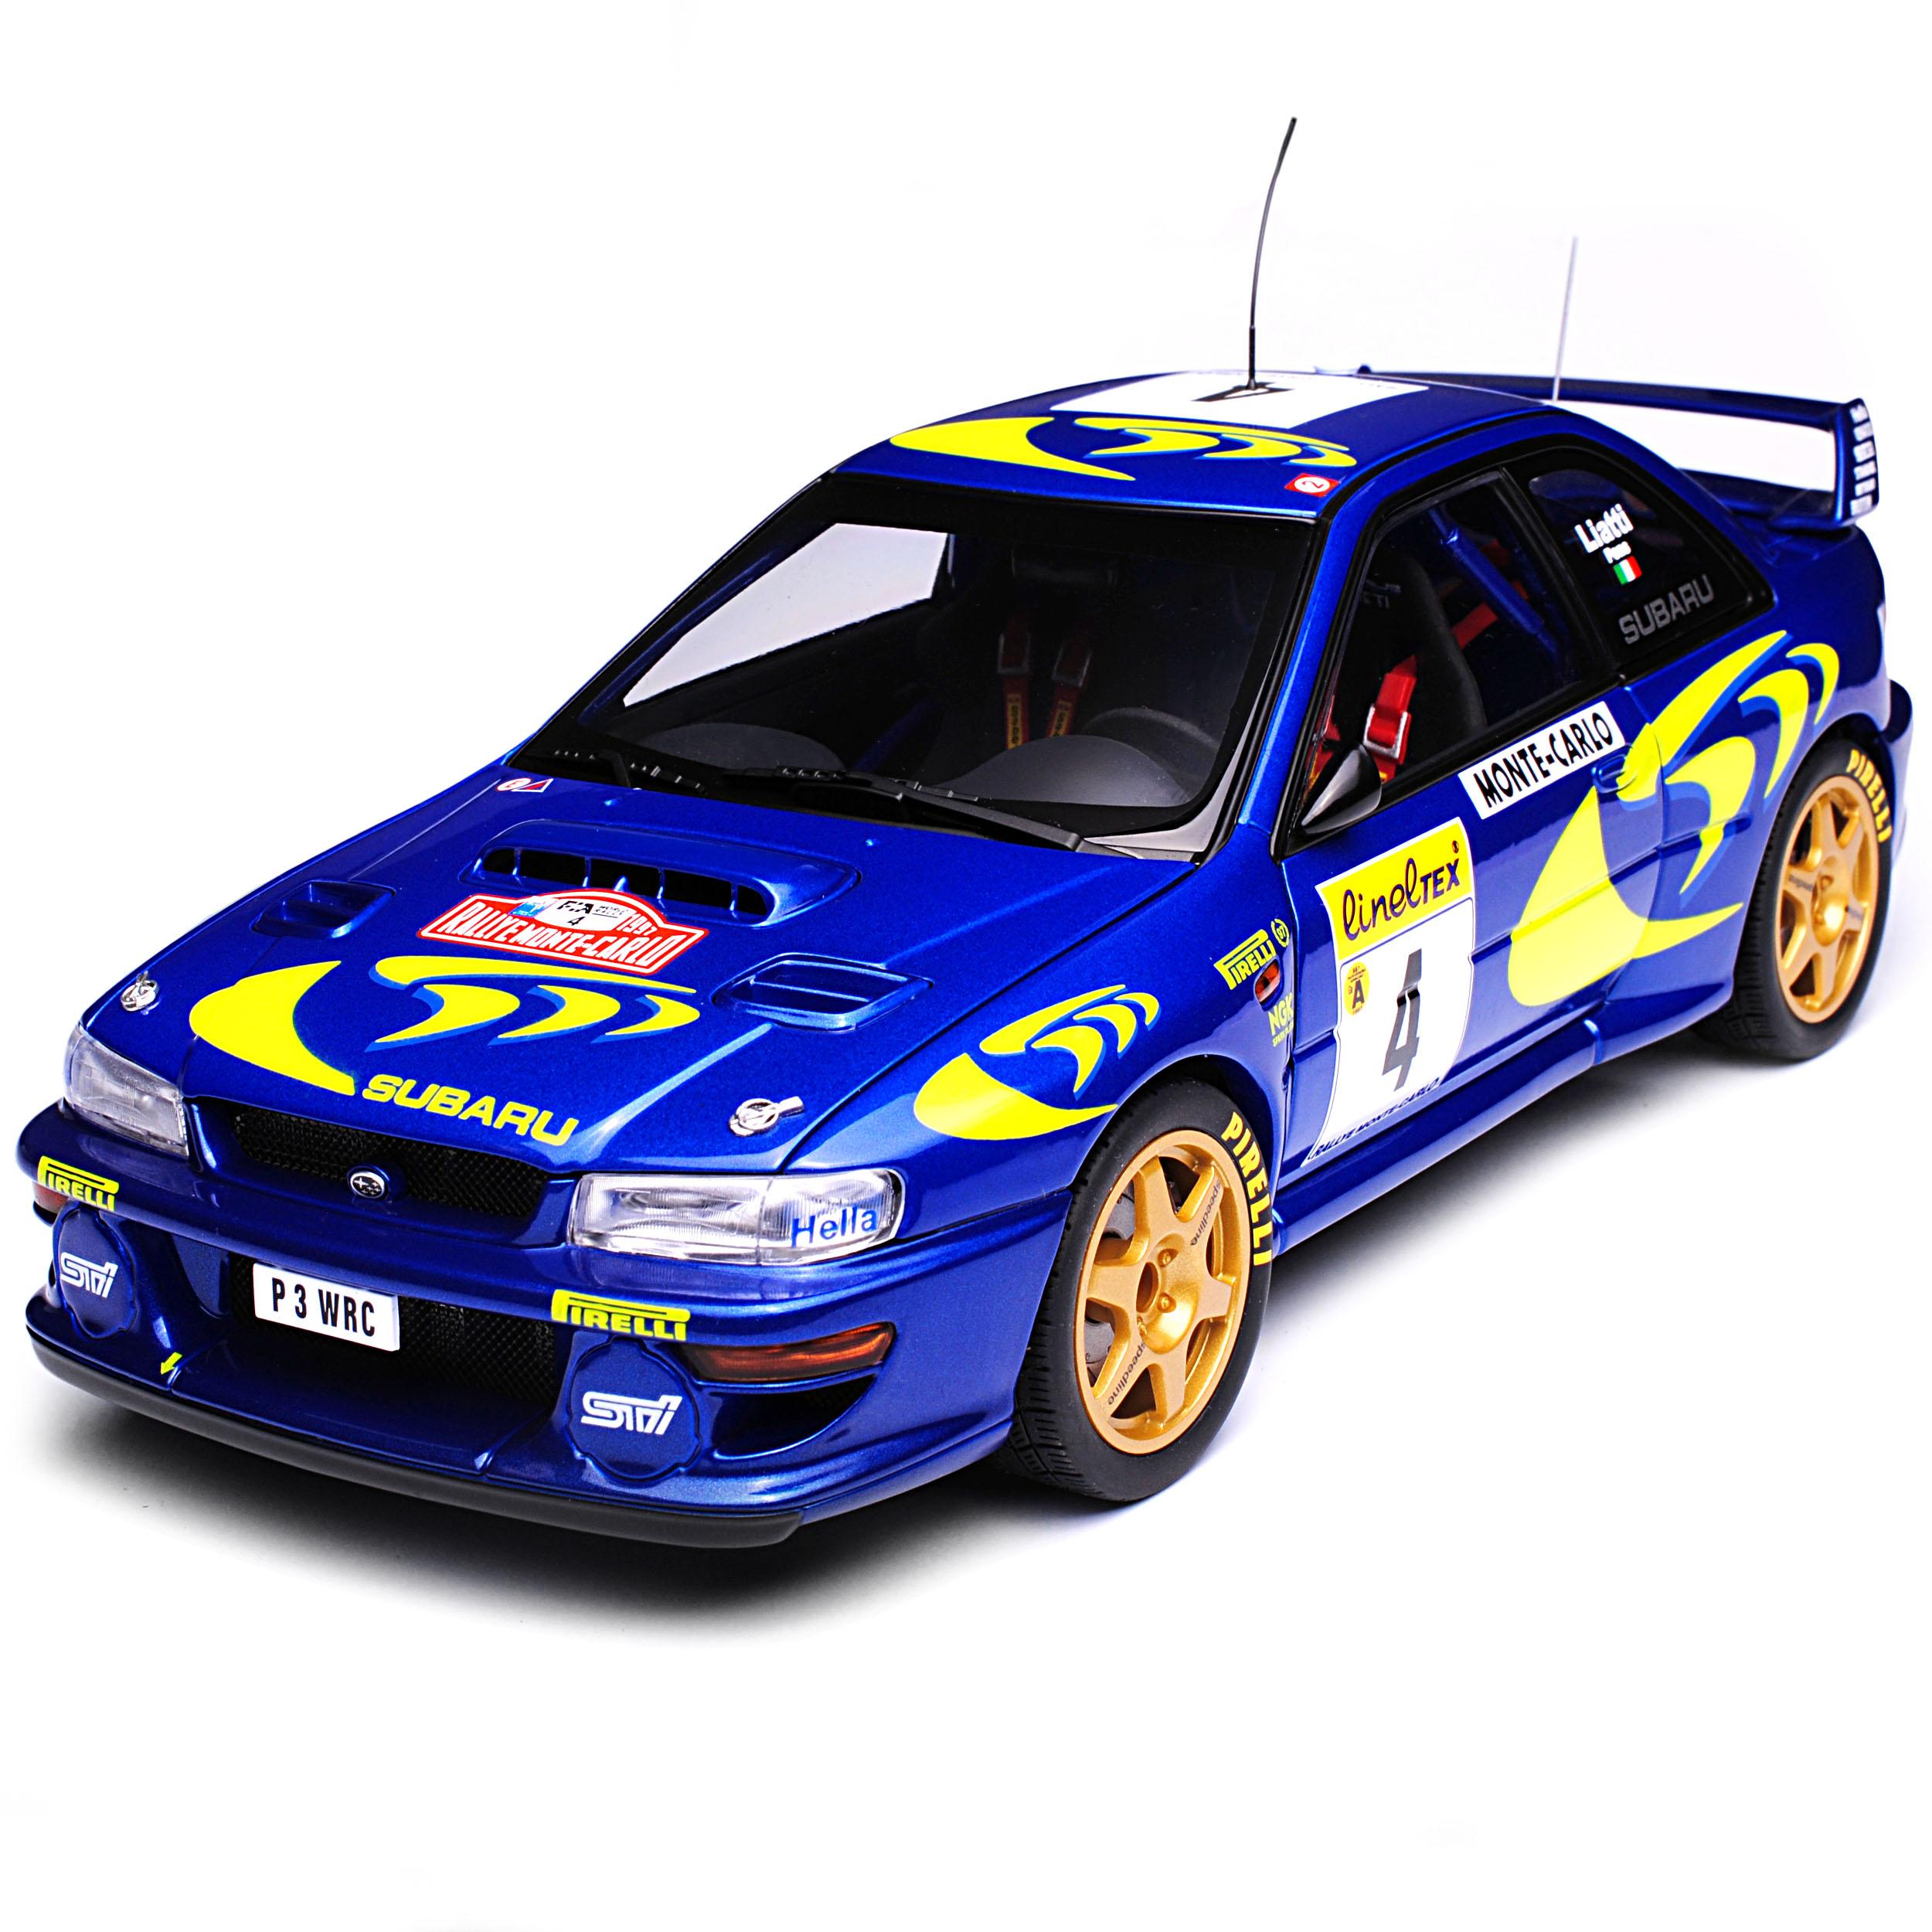 Subaru Impreza WRX STI WRC Liatti Gewinner Rally Rally Rally Monte Carlo Monaco 1997 89791..  | Leicht zu reinigende Oberfläche  436a00